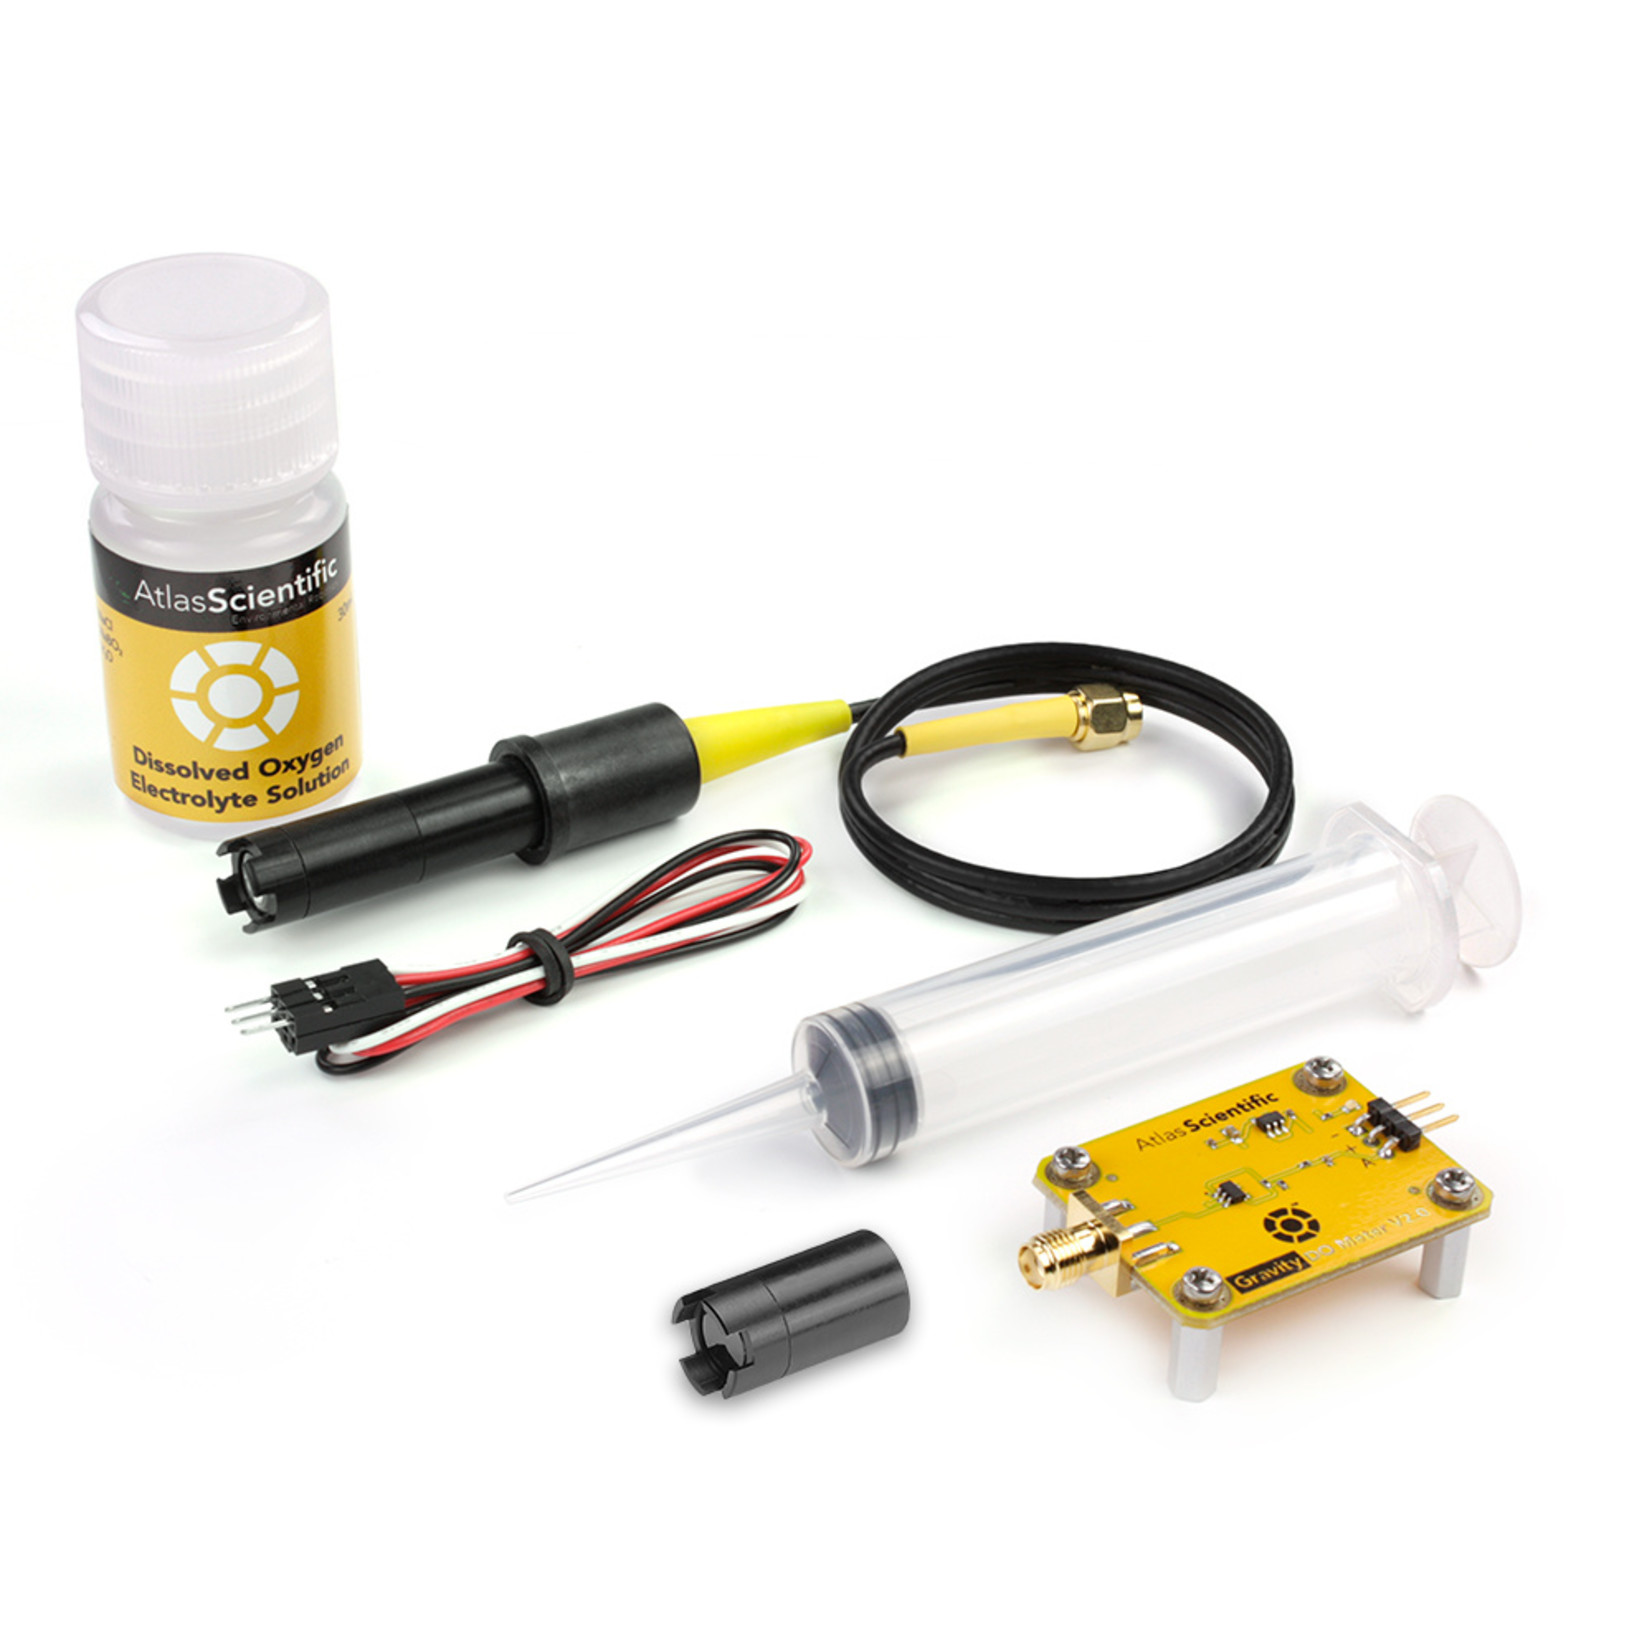 Atlas Scientific Gravity™ Analog Opgeloste Zuurstof Sensor Kit